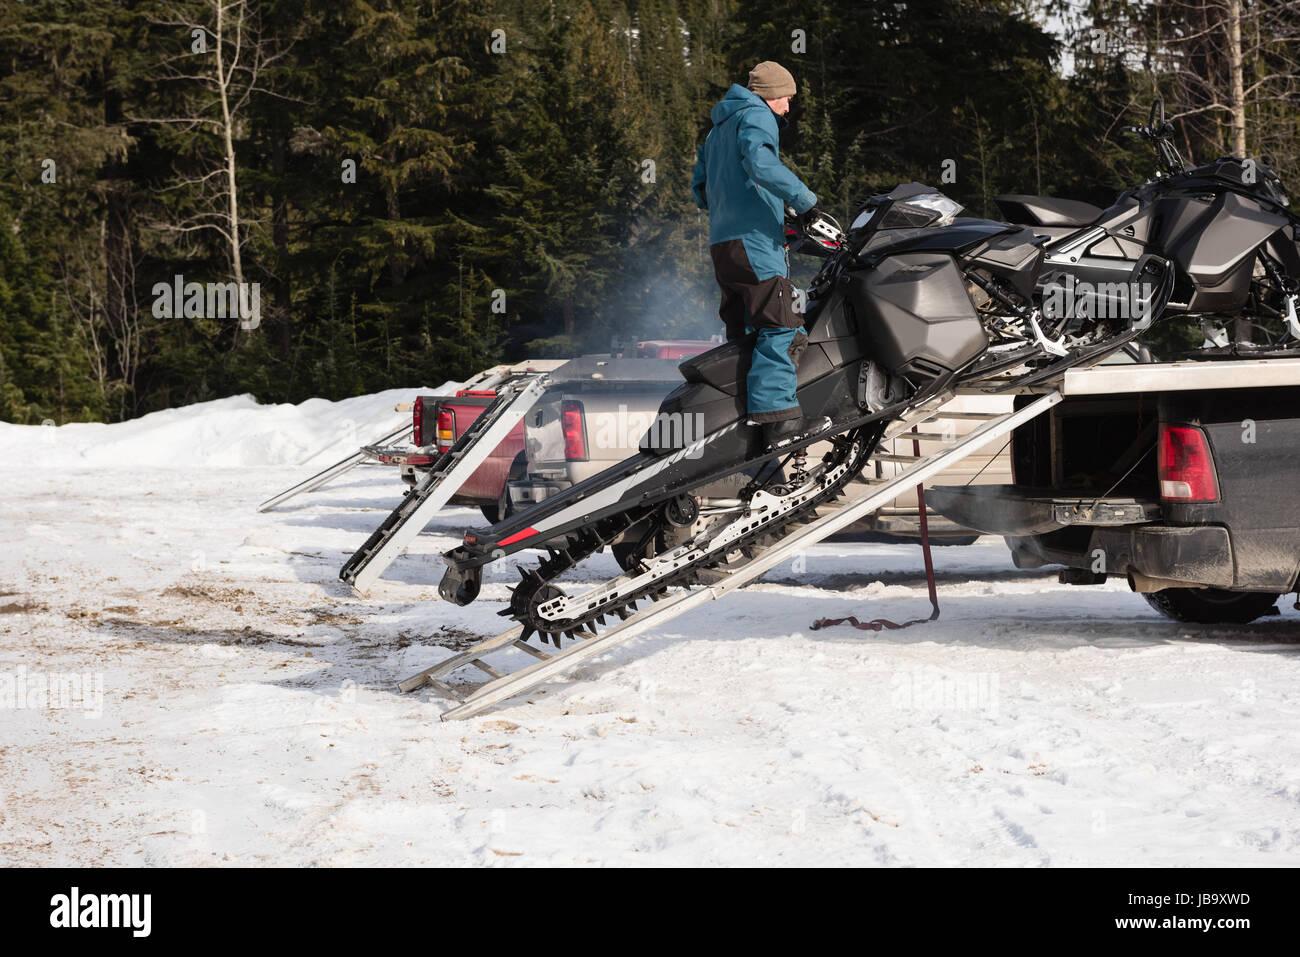 Man loading snowmobile on van during winter - Stock Image